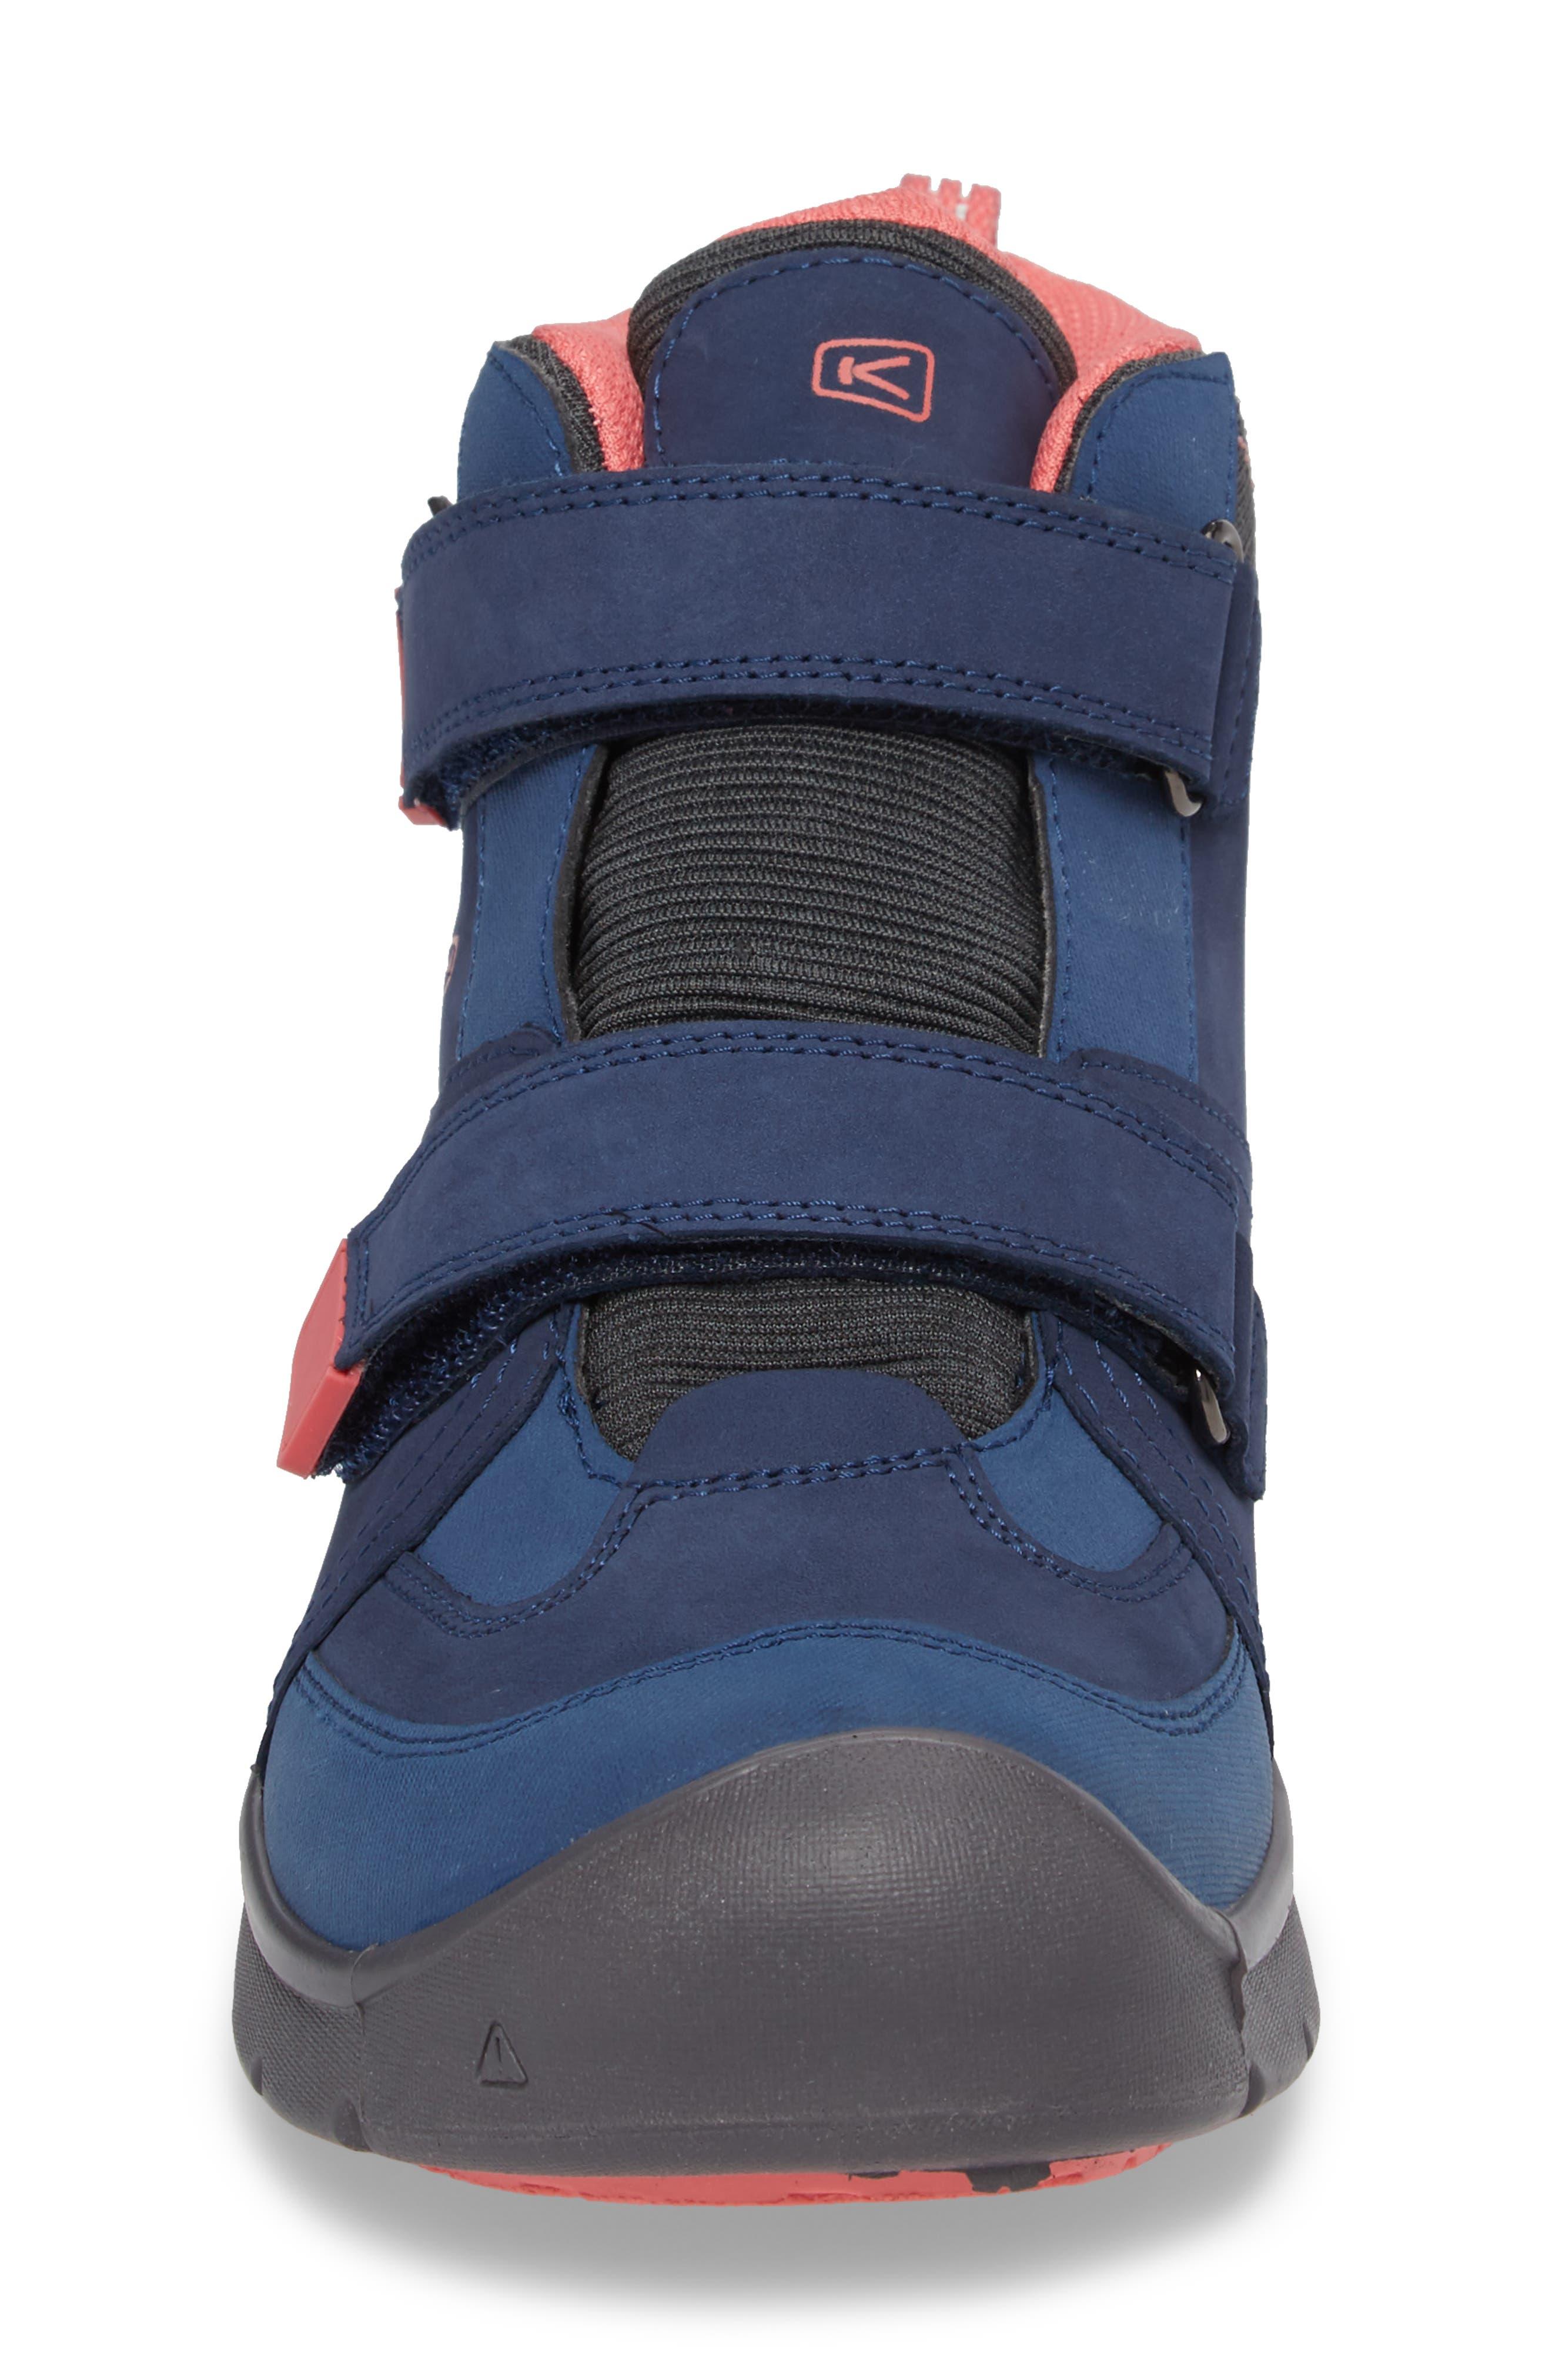 Alternate Image 4  - Keen Hikeport Strap Waterproof Mid Boot (Toddler, Little Kid & Big Kid)